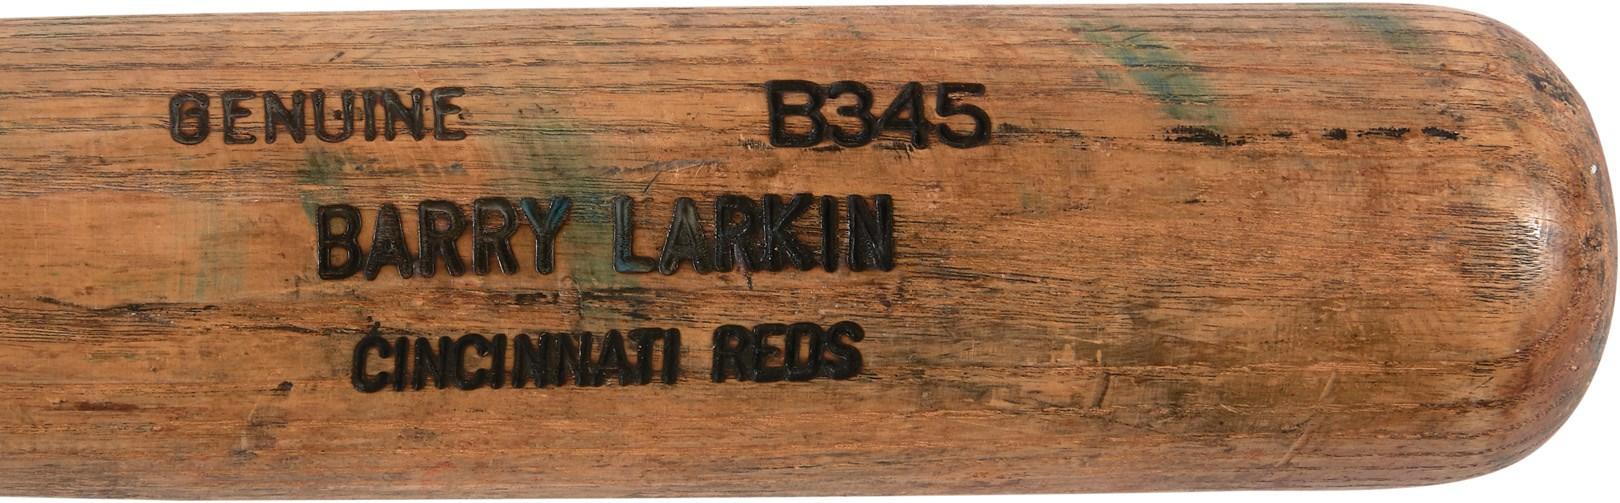 Pete Rose & Cincinnati Reds - Leland's Classic